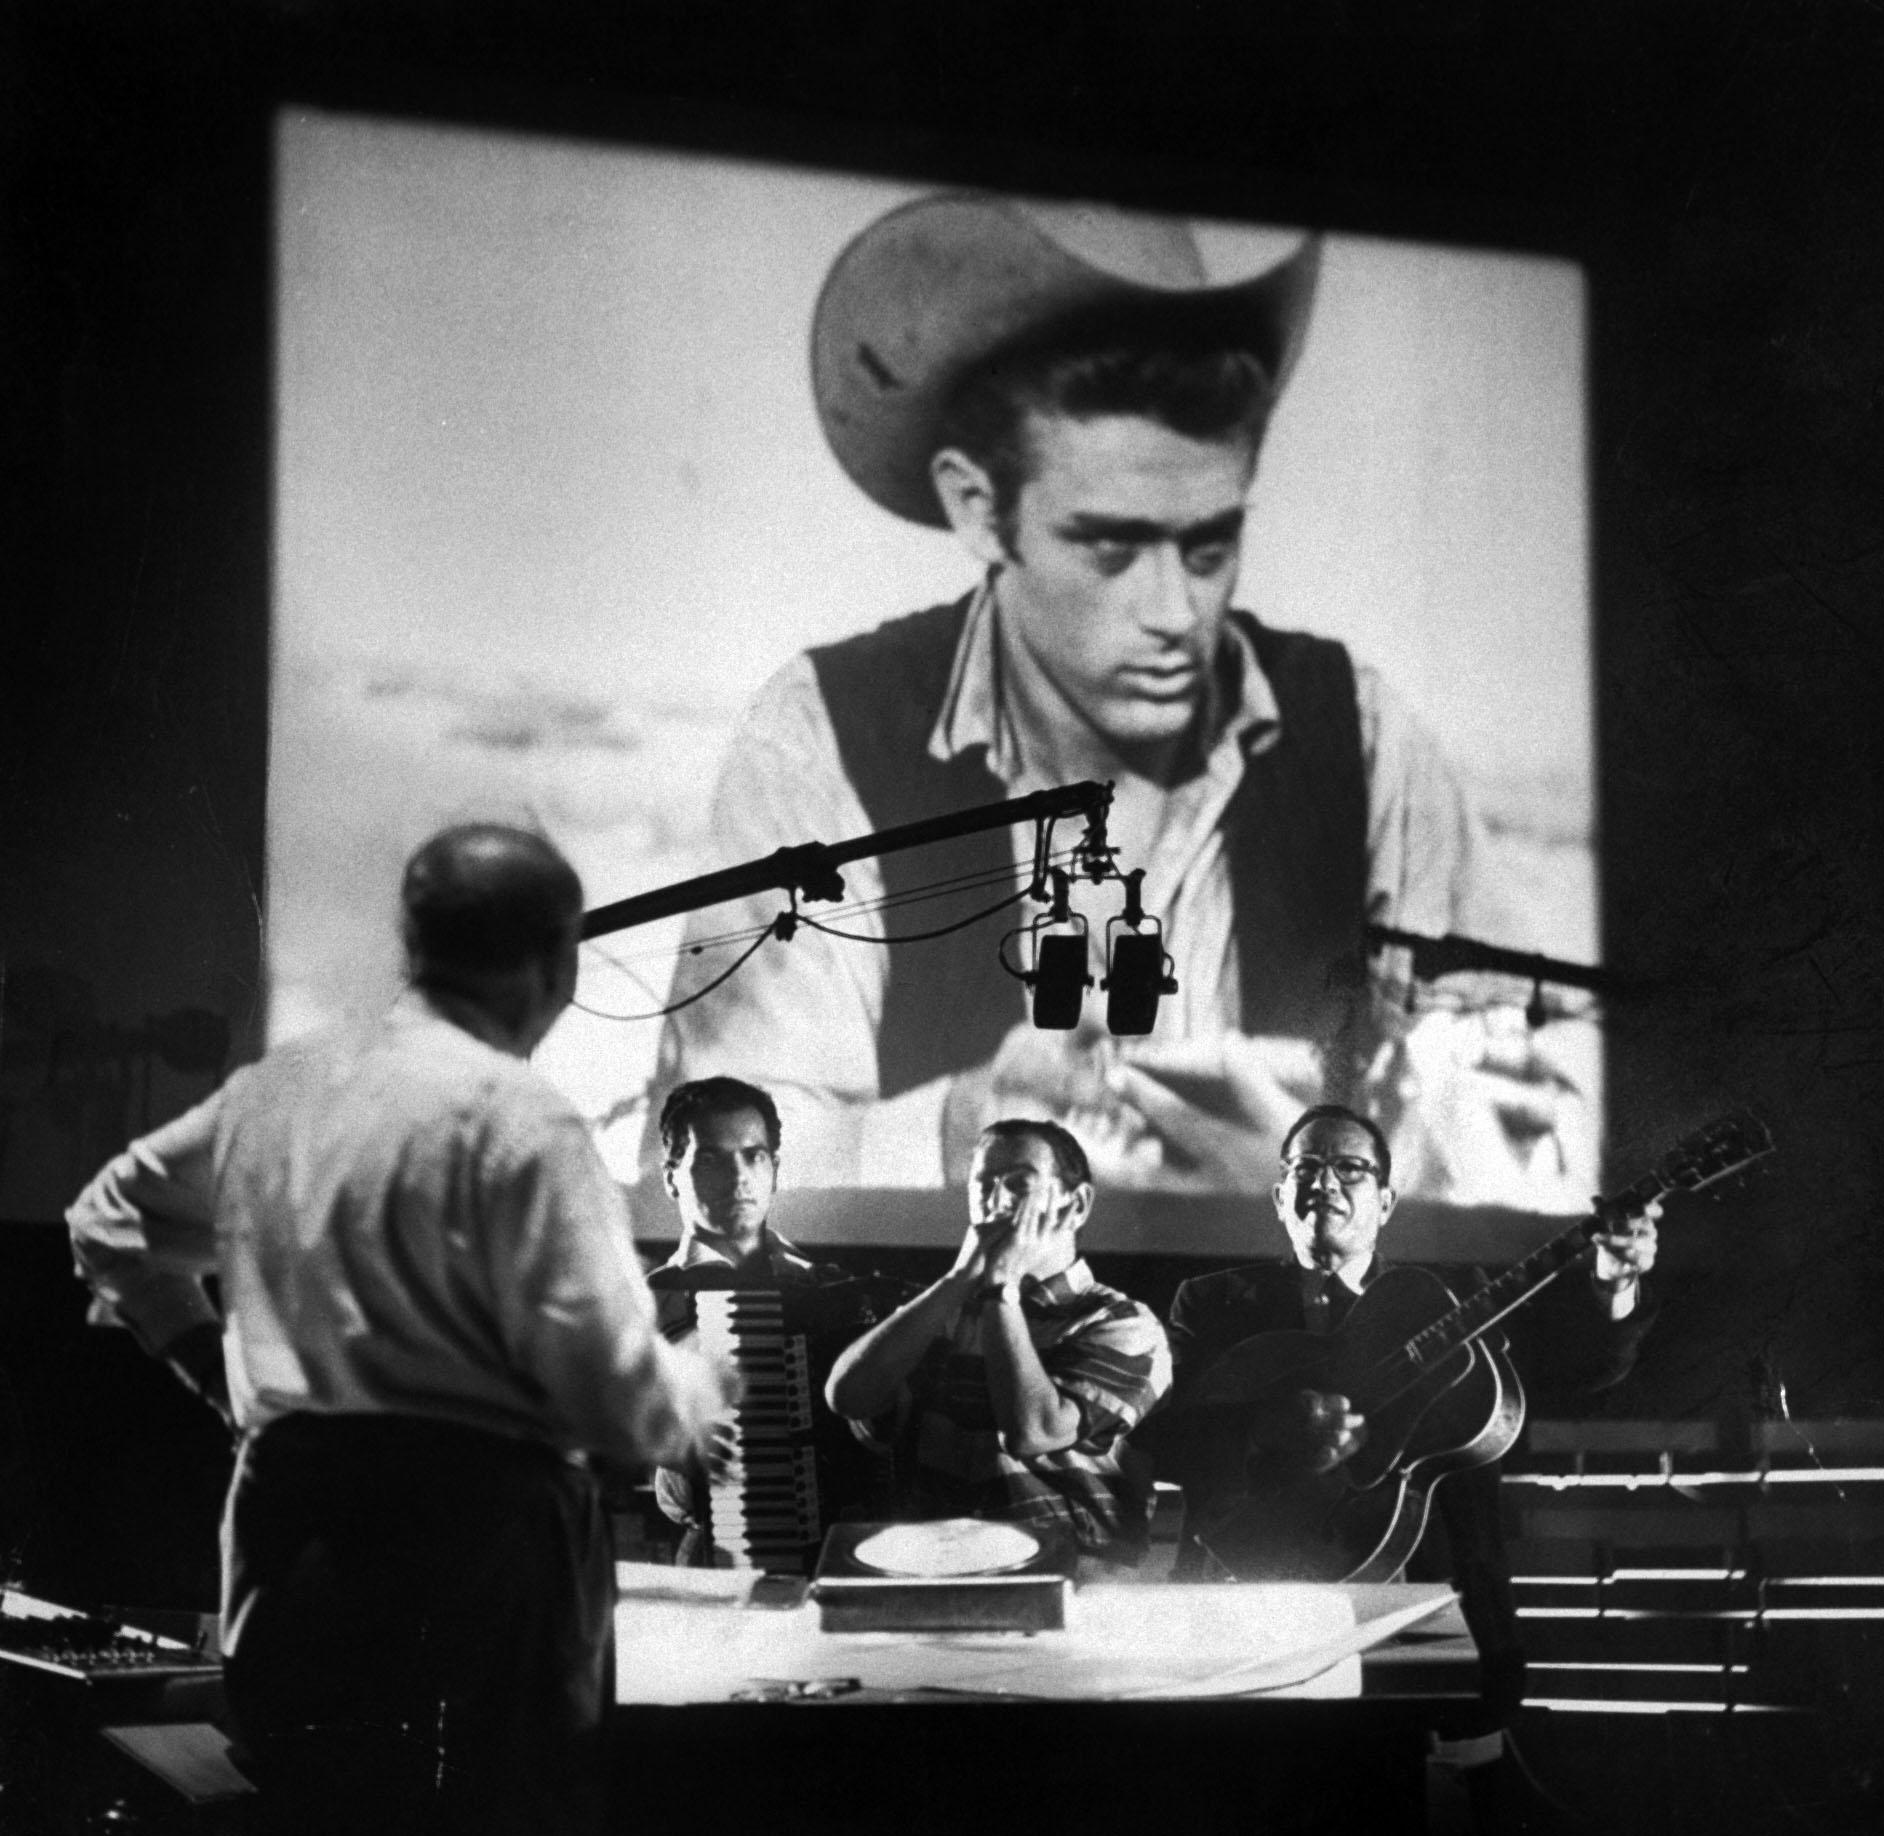 James Dean S Last Film Giant Turns 60 San Antonio